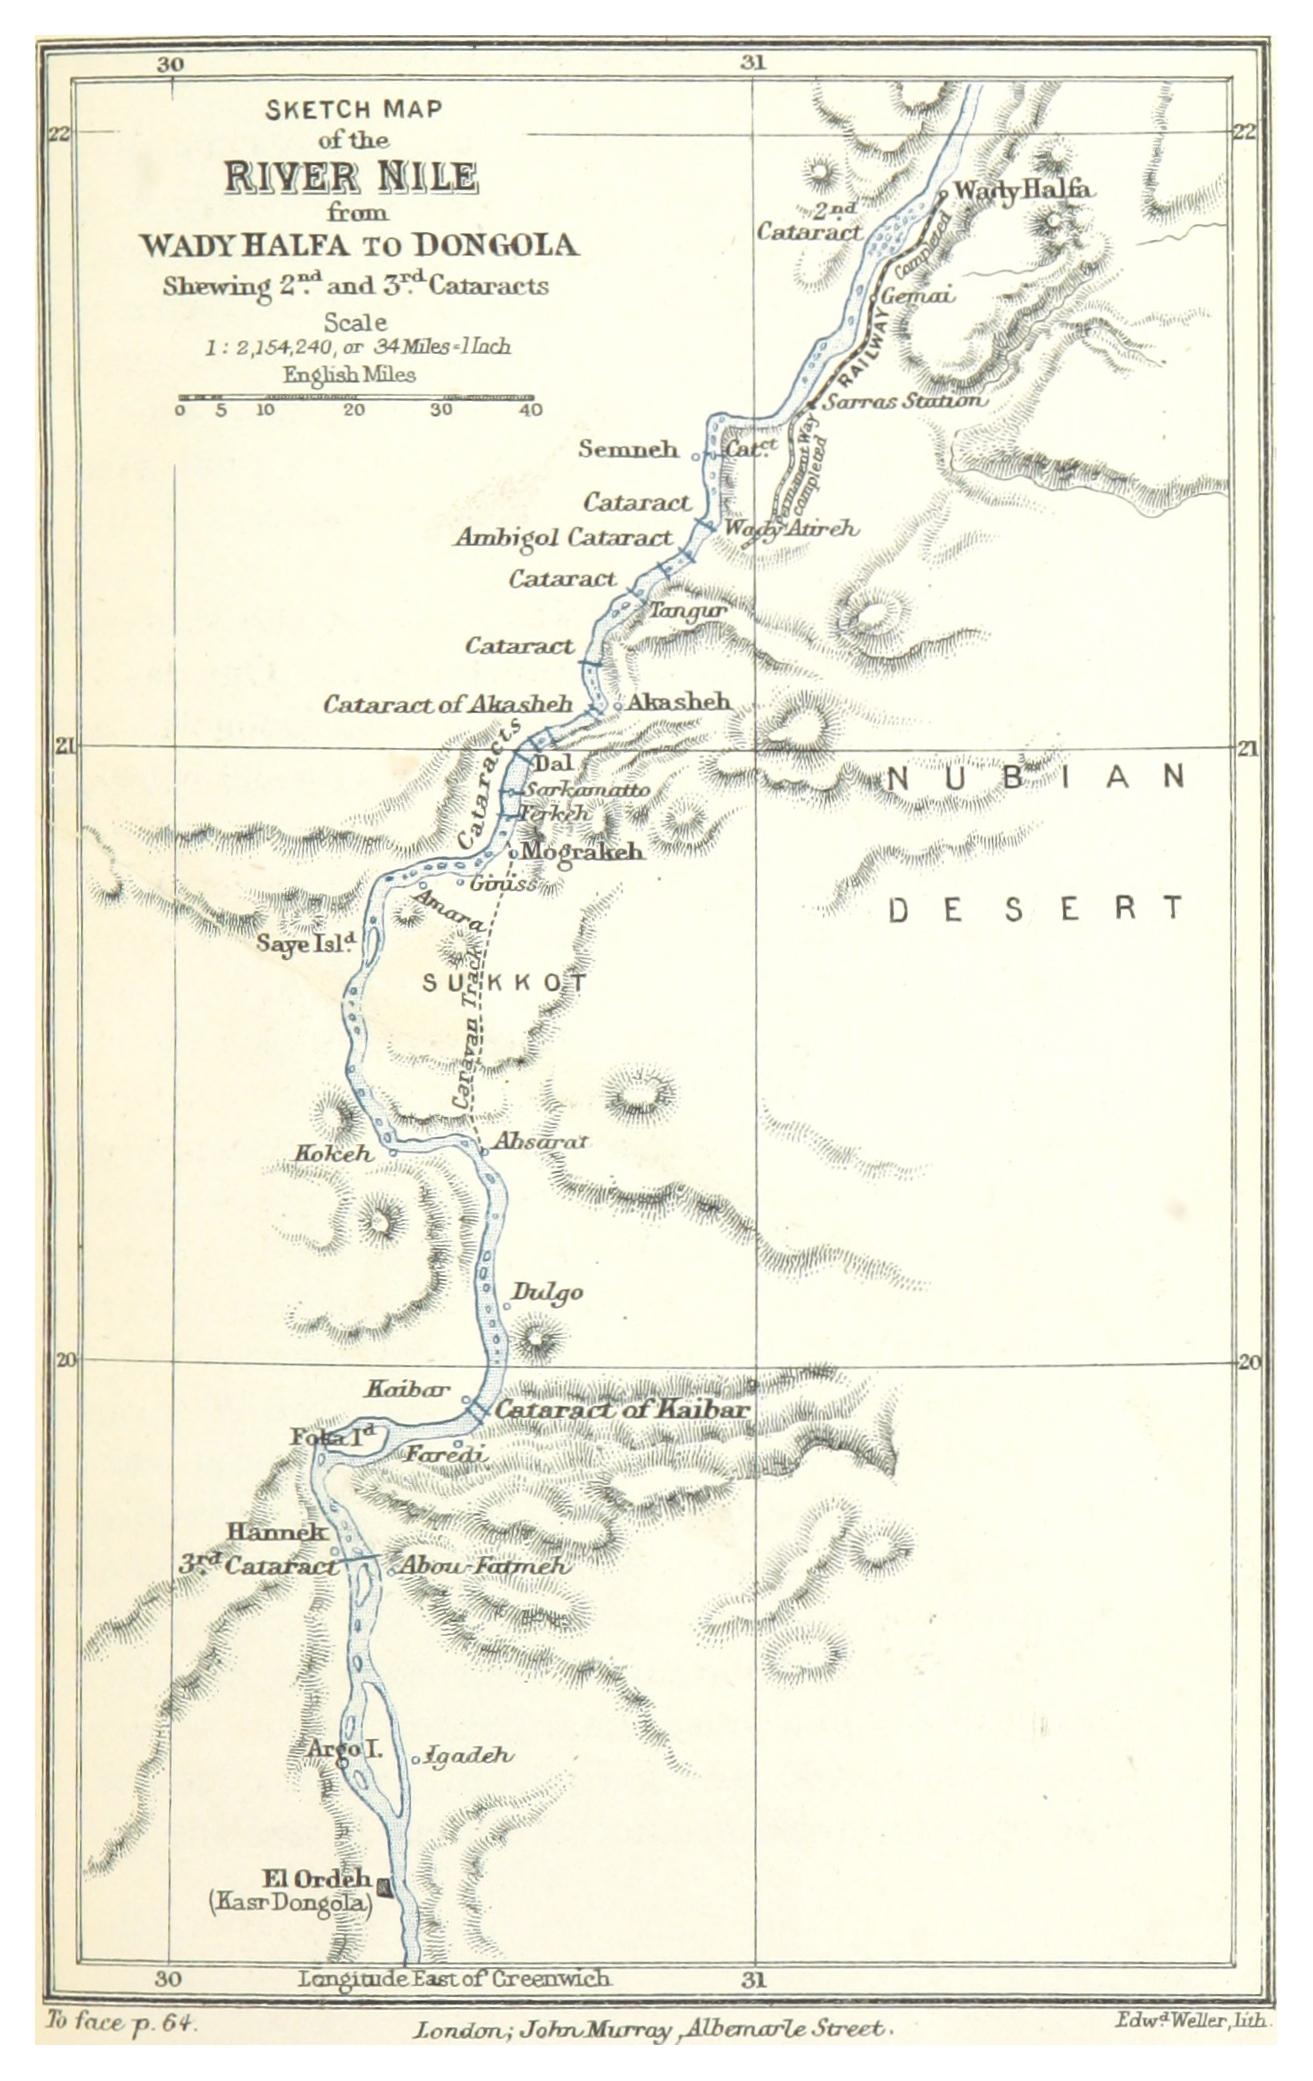 FileMACDONALD1887 p085 SKETCH MAP OF THE RIVER NILE WADY HALFA